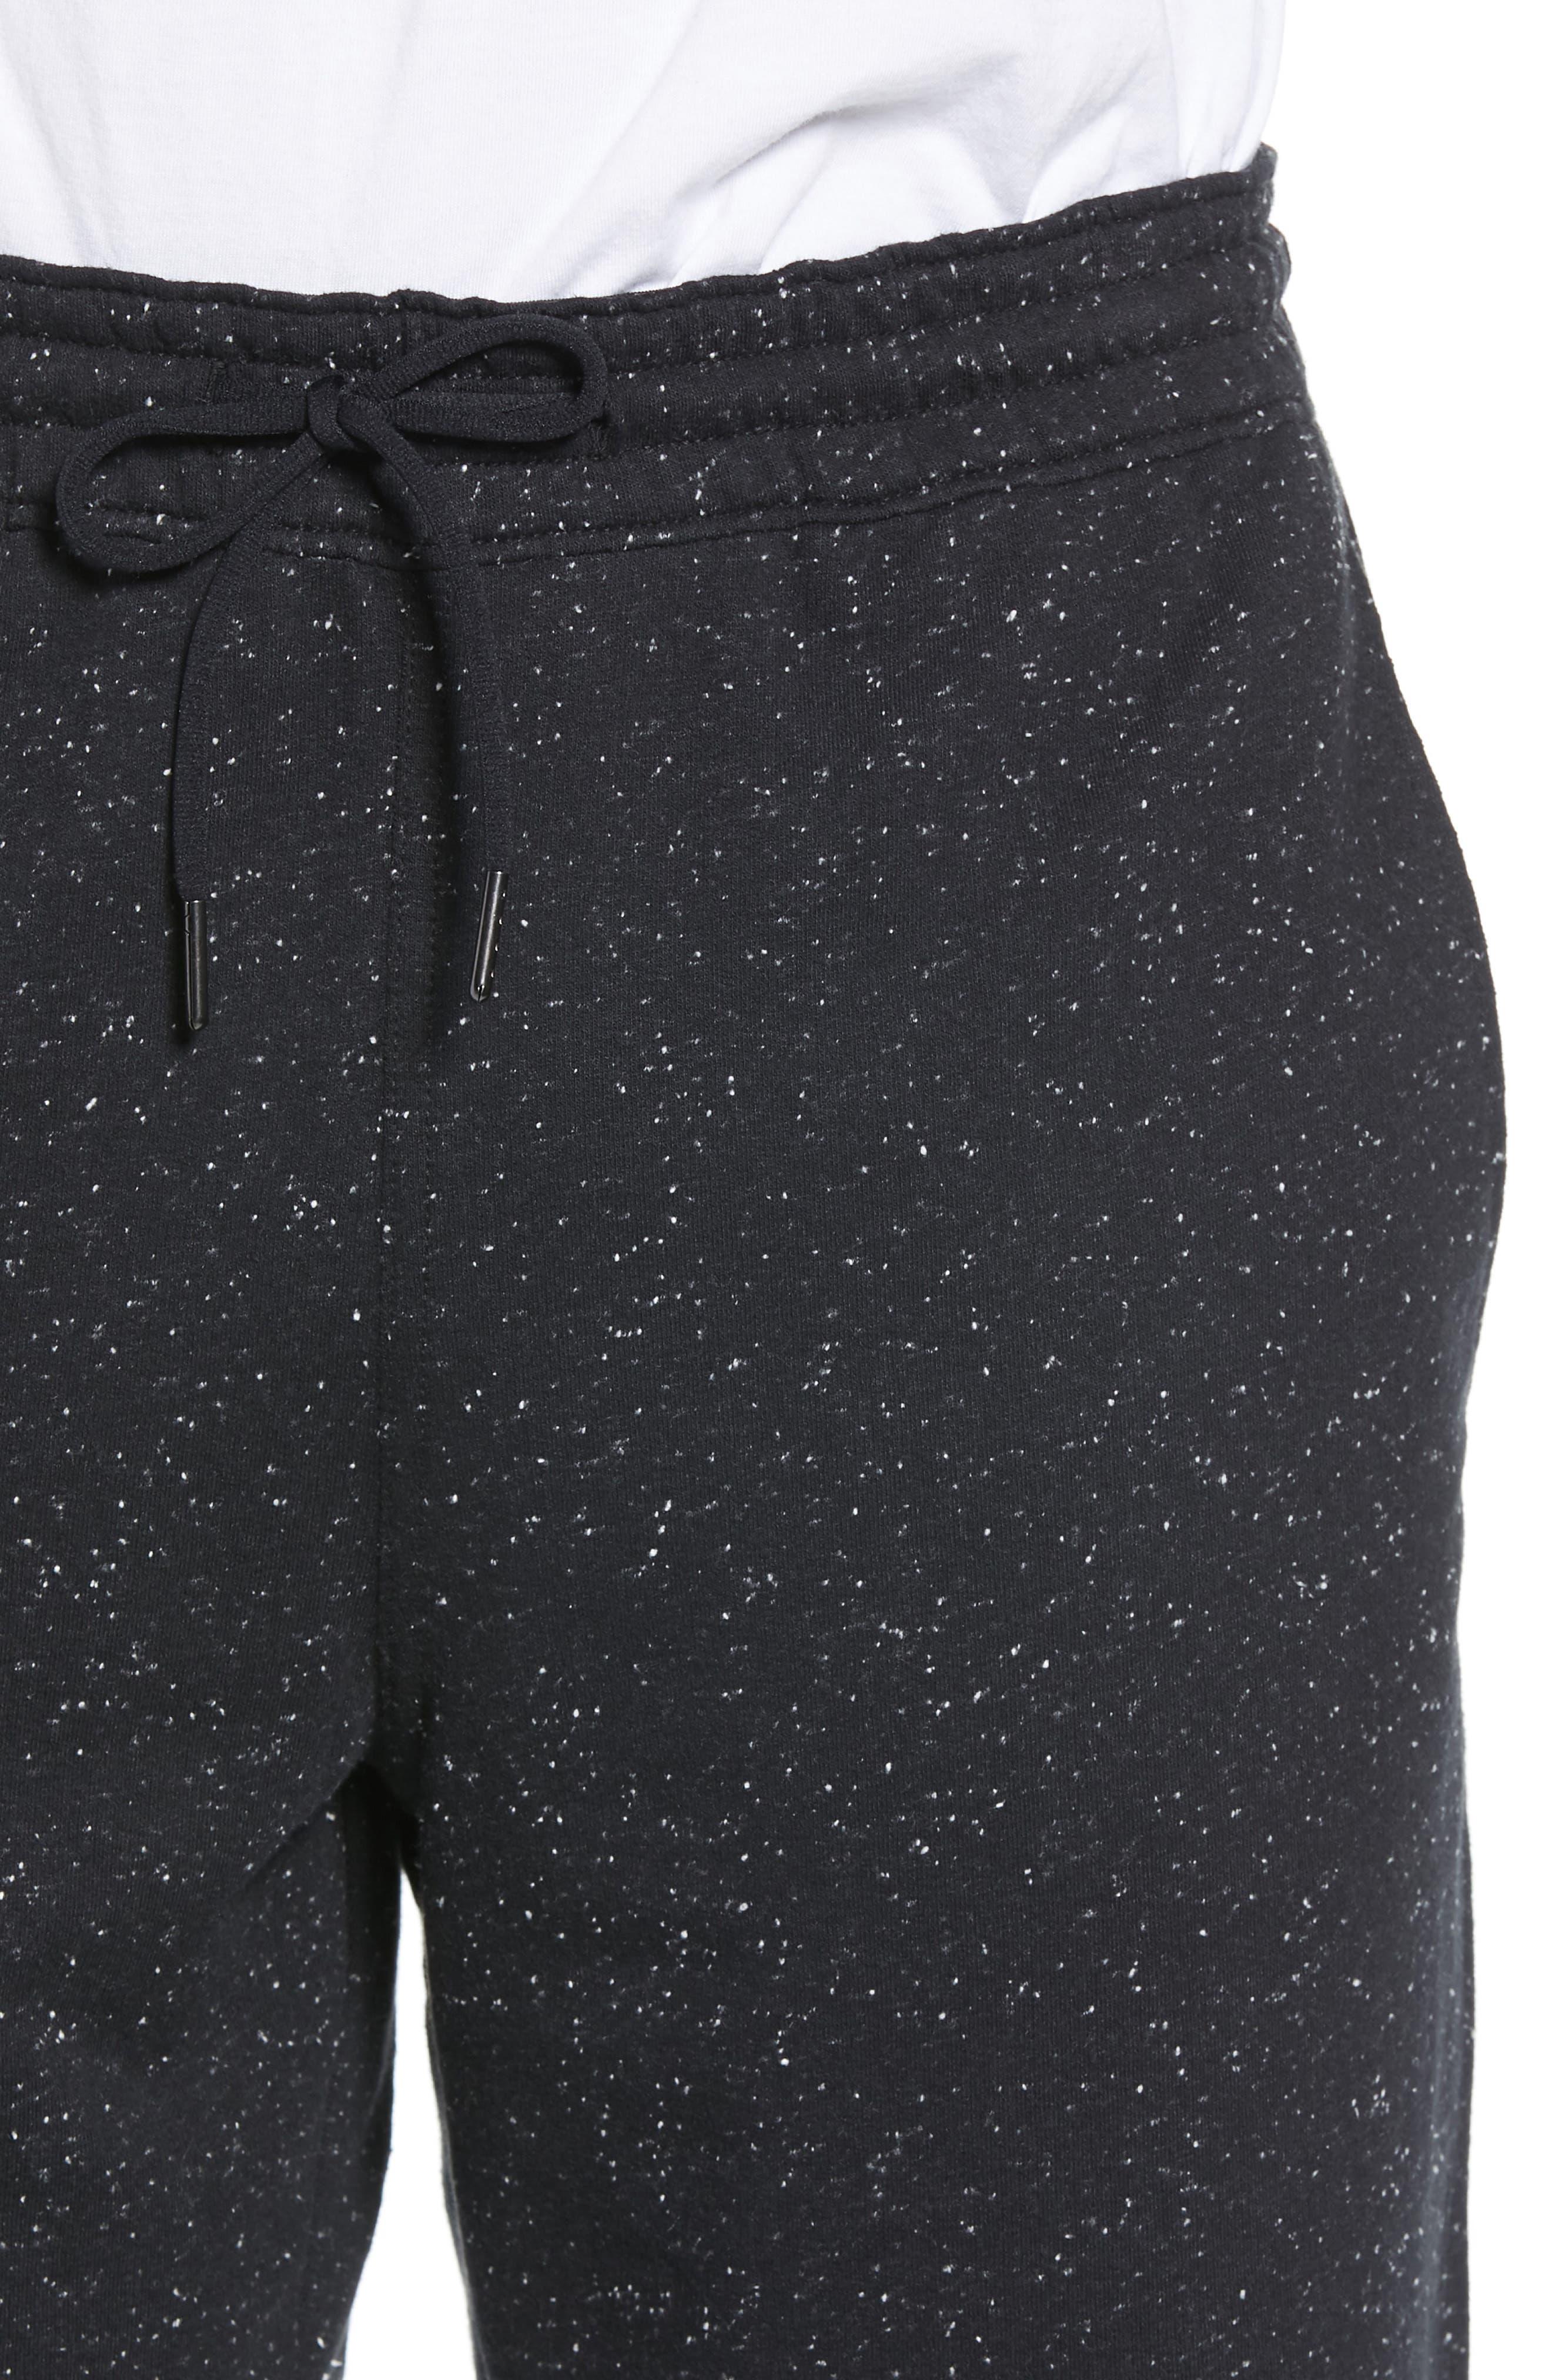 ZELLA, Neppy Fleece Athletic Shorts, Alternate thumbnail 5, color, 001